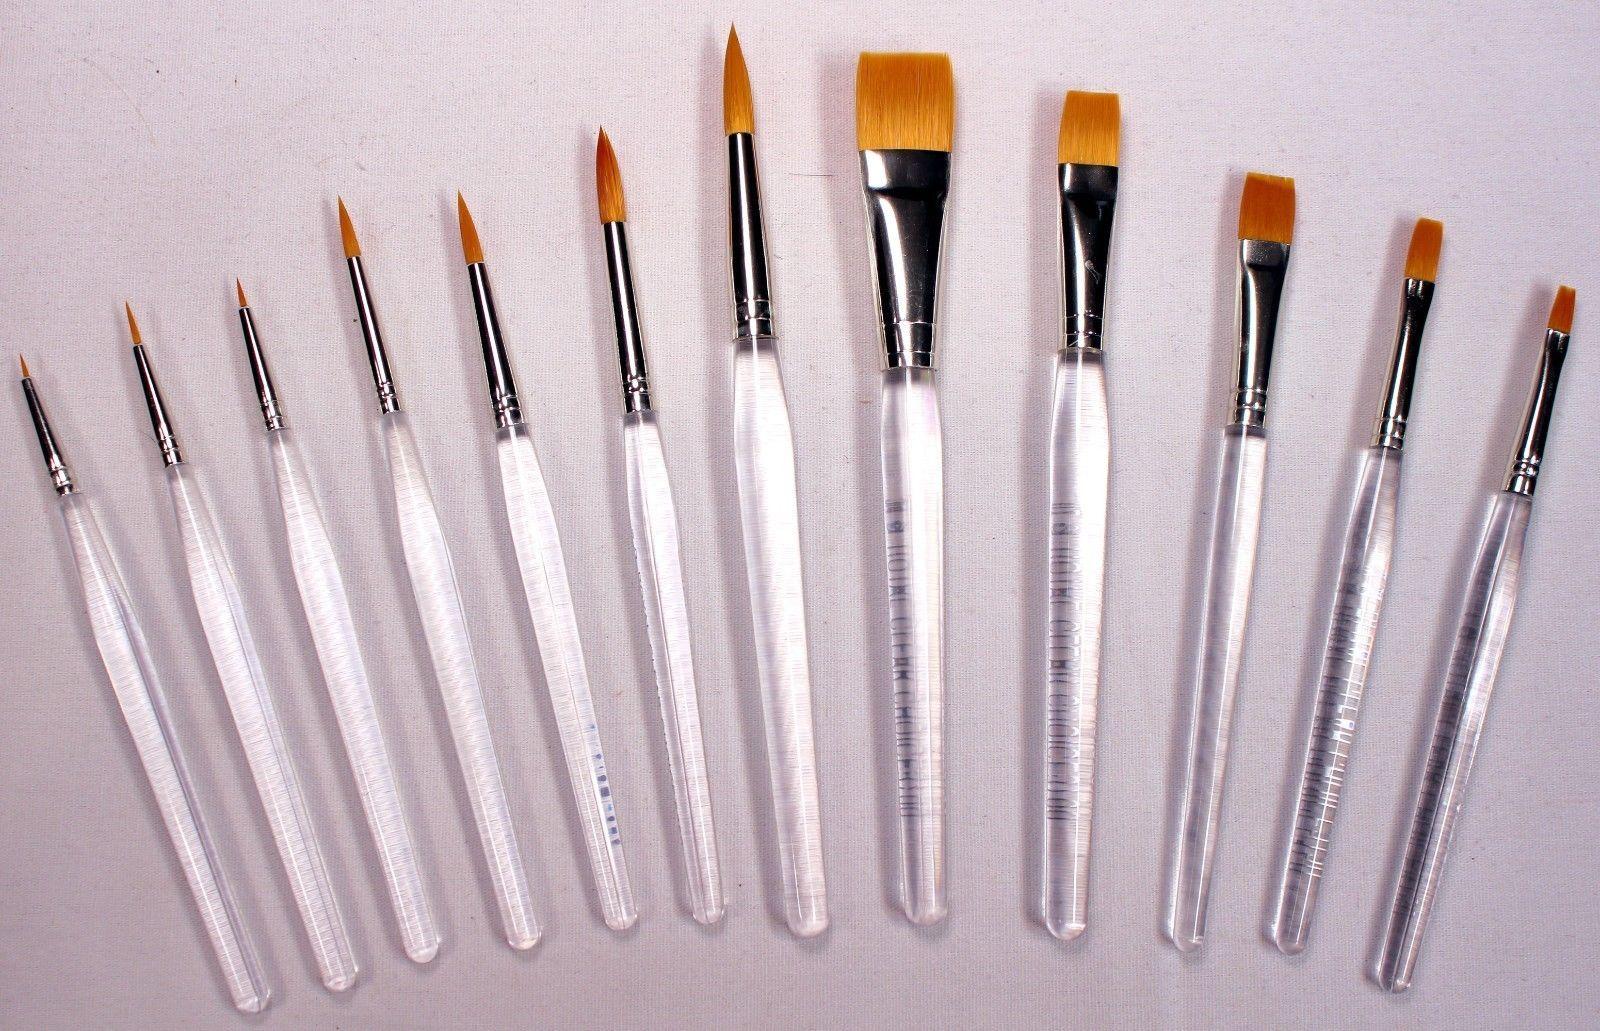 Artists Brushes 57209 12 Gold Taklon Bristle Clear Acrylic Handle Art Craft Hobby Paint Brushes Buy It Now Clear Acrylic Crafts Arts And Crafts Supplies